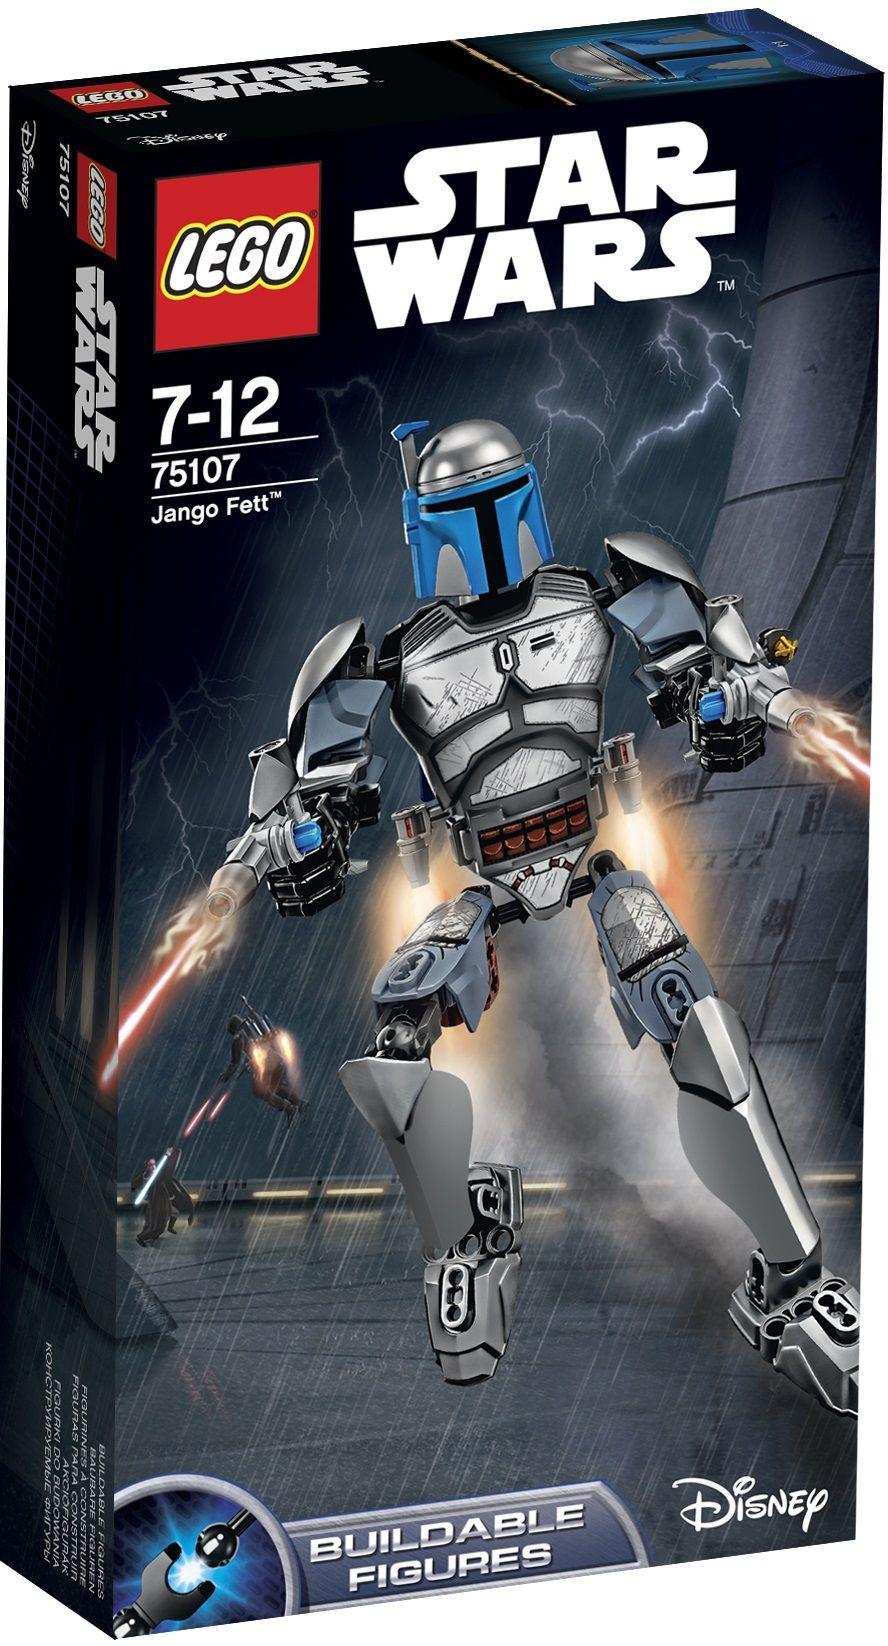 Upcoming lego star wars the force awakens 2015 sets geek - Bd lego star wars ...